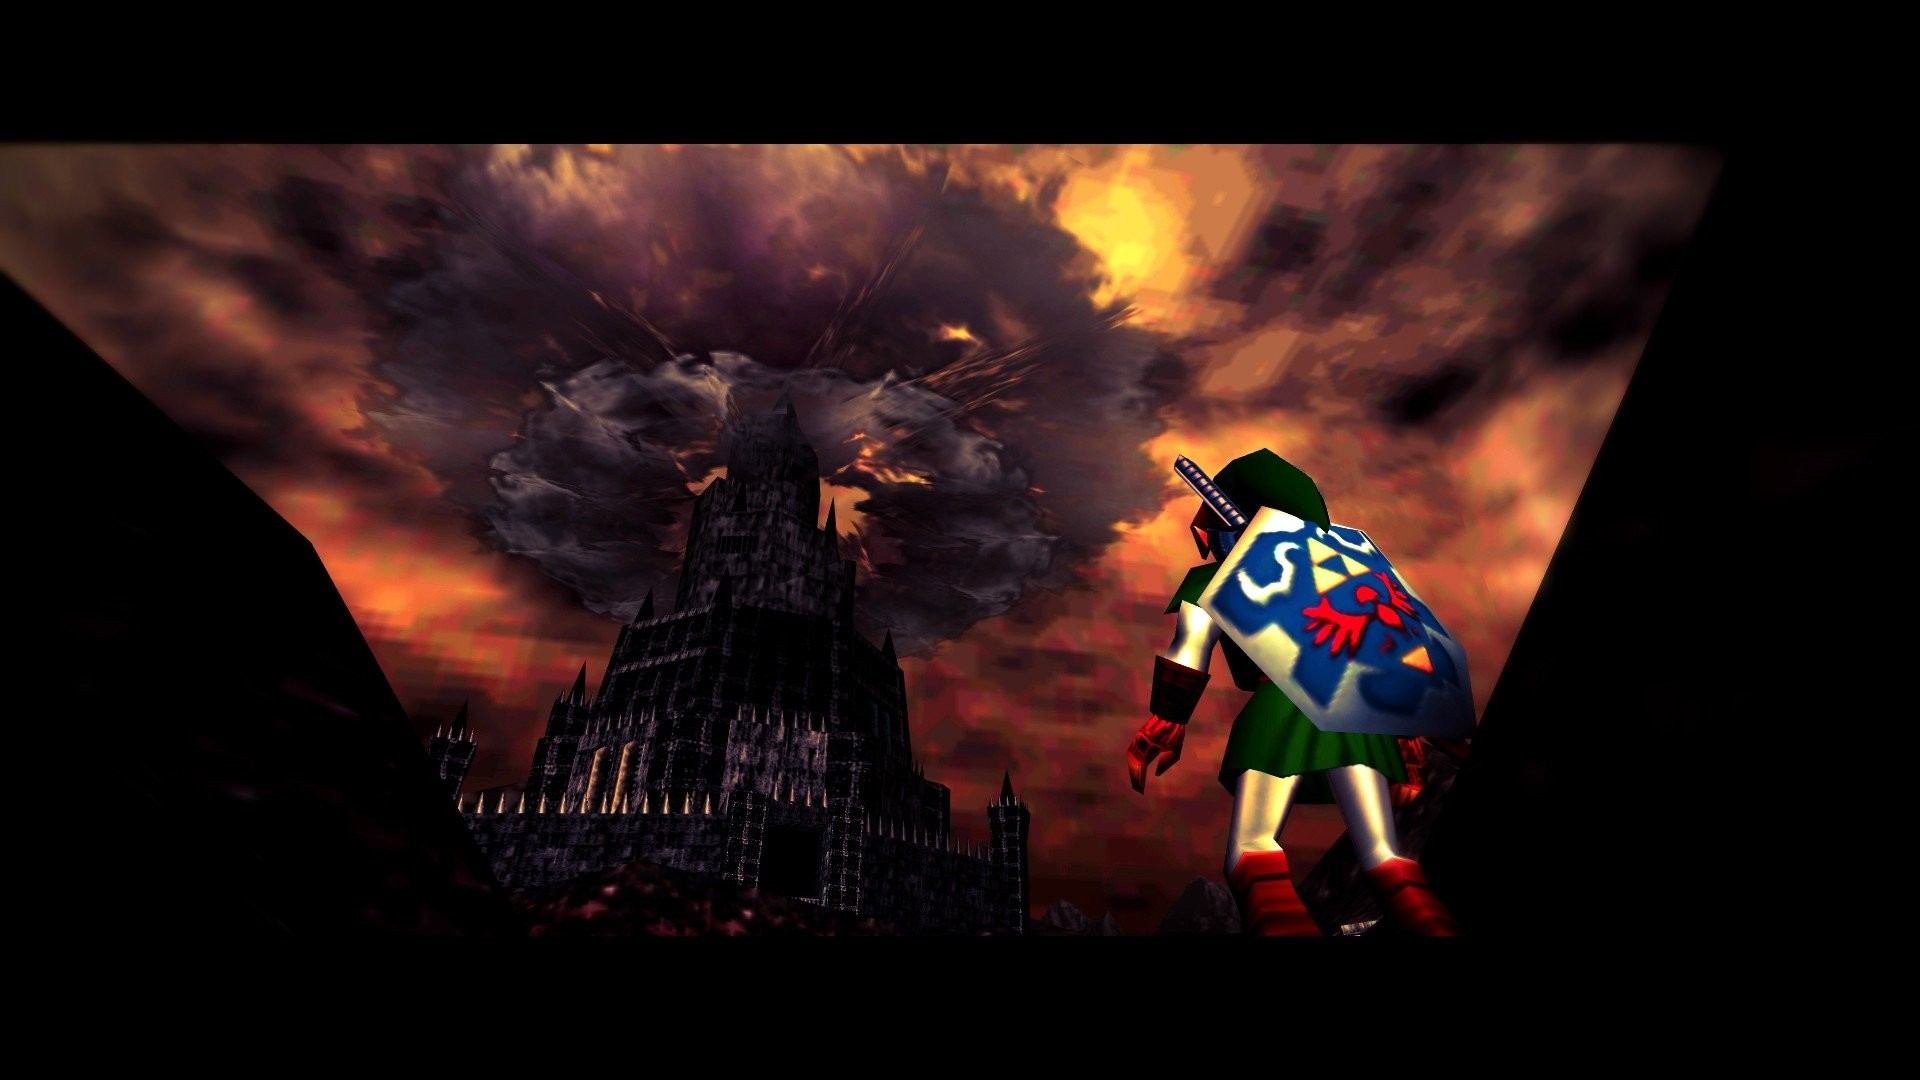 Link, The Legend of Zelda, The Legend of Zelda: Ocarina of Time, N64,  Nintendo 64, Video games HD Wallpapers / Desktop and Mobile Images & Photos